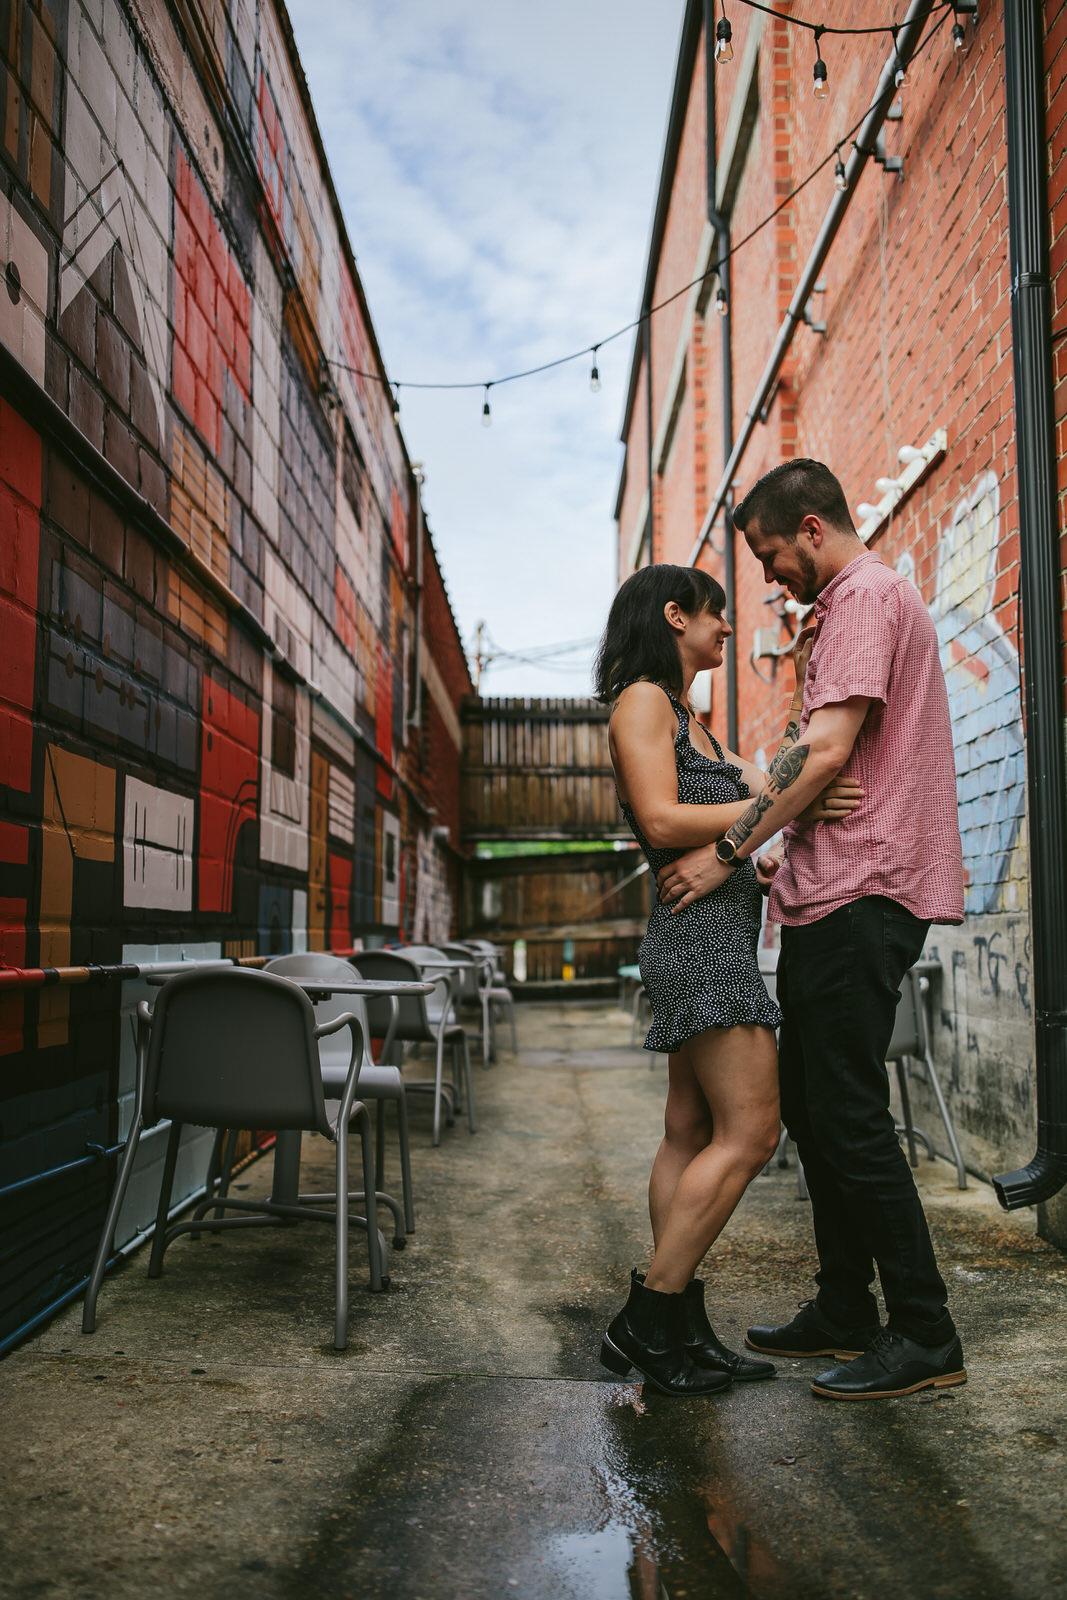 murray-hill-jacksonville-couple-vagabond-coffee-portrait-session-tiny-house-photo.jpg